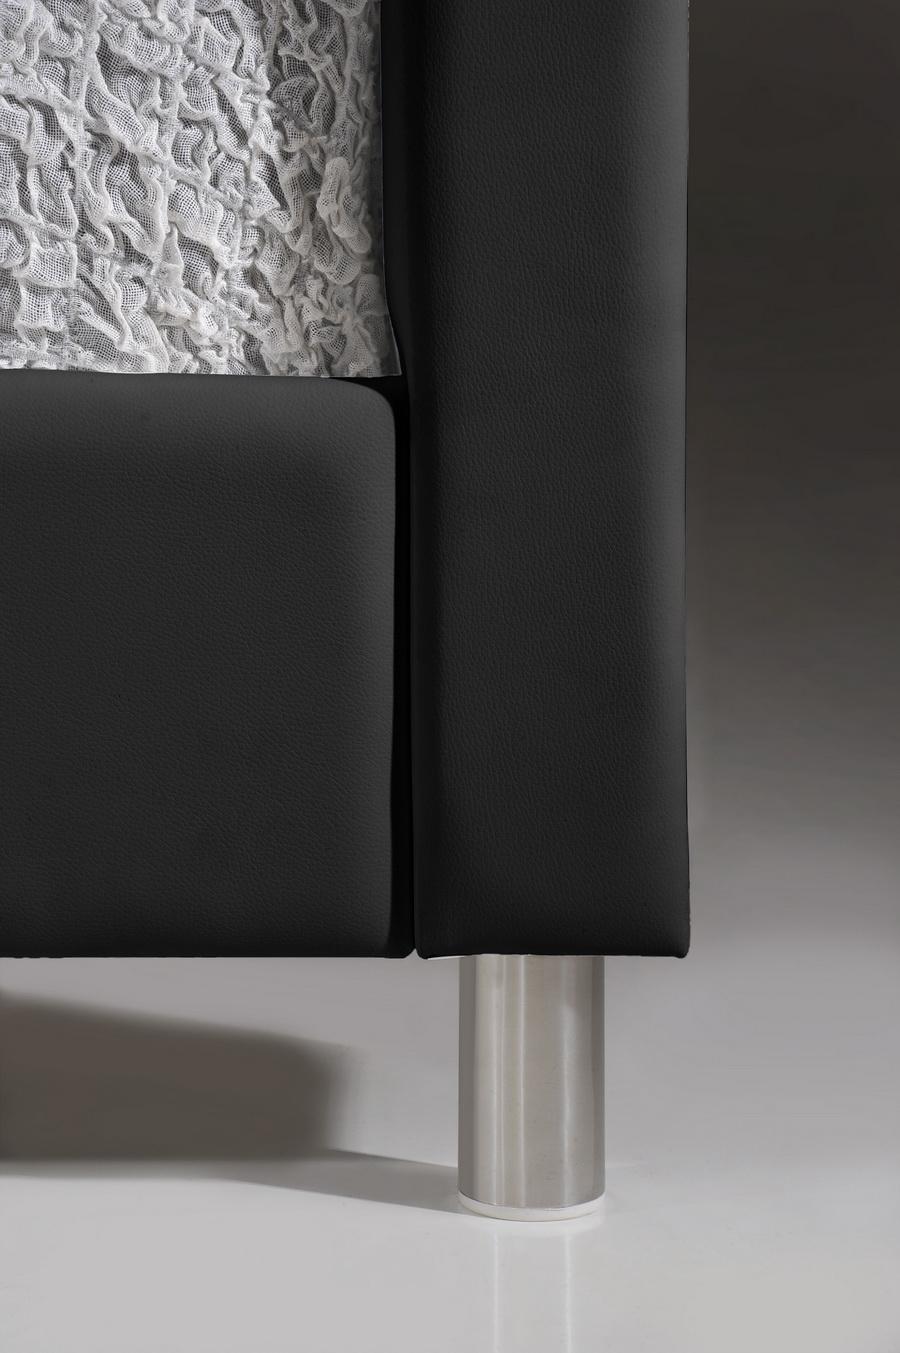 baxton studio carlotta black modern bed with upholstered headboard  -  baxton studio carlotta black modern bed with upholstered headboard queen size  bsobbtblack